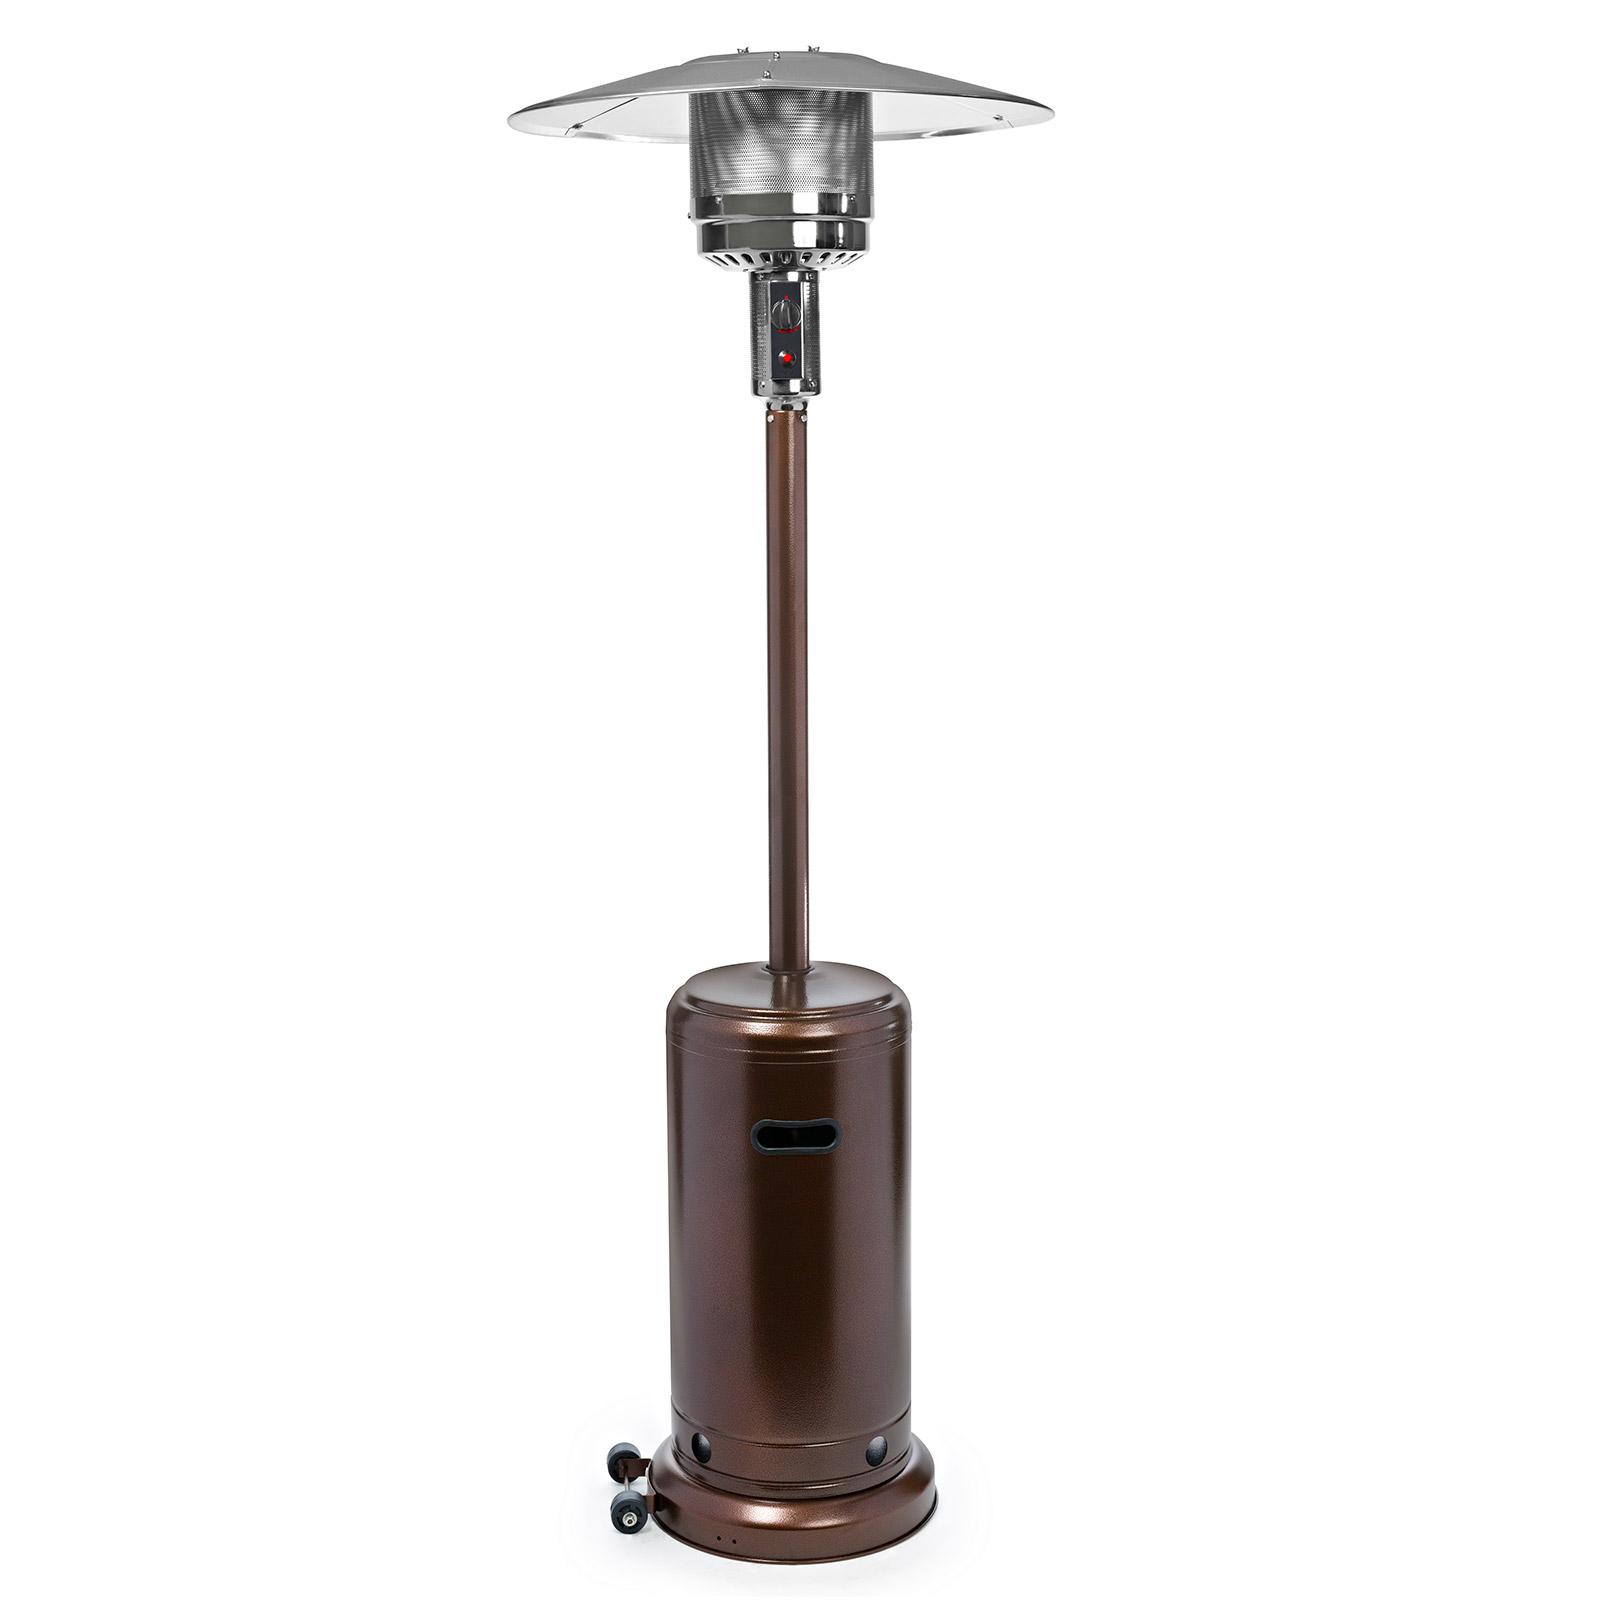 Thermo Tiki Premium Floor standing Propane Outdoor Patio Heater W